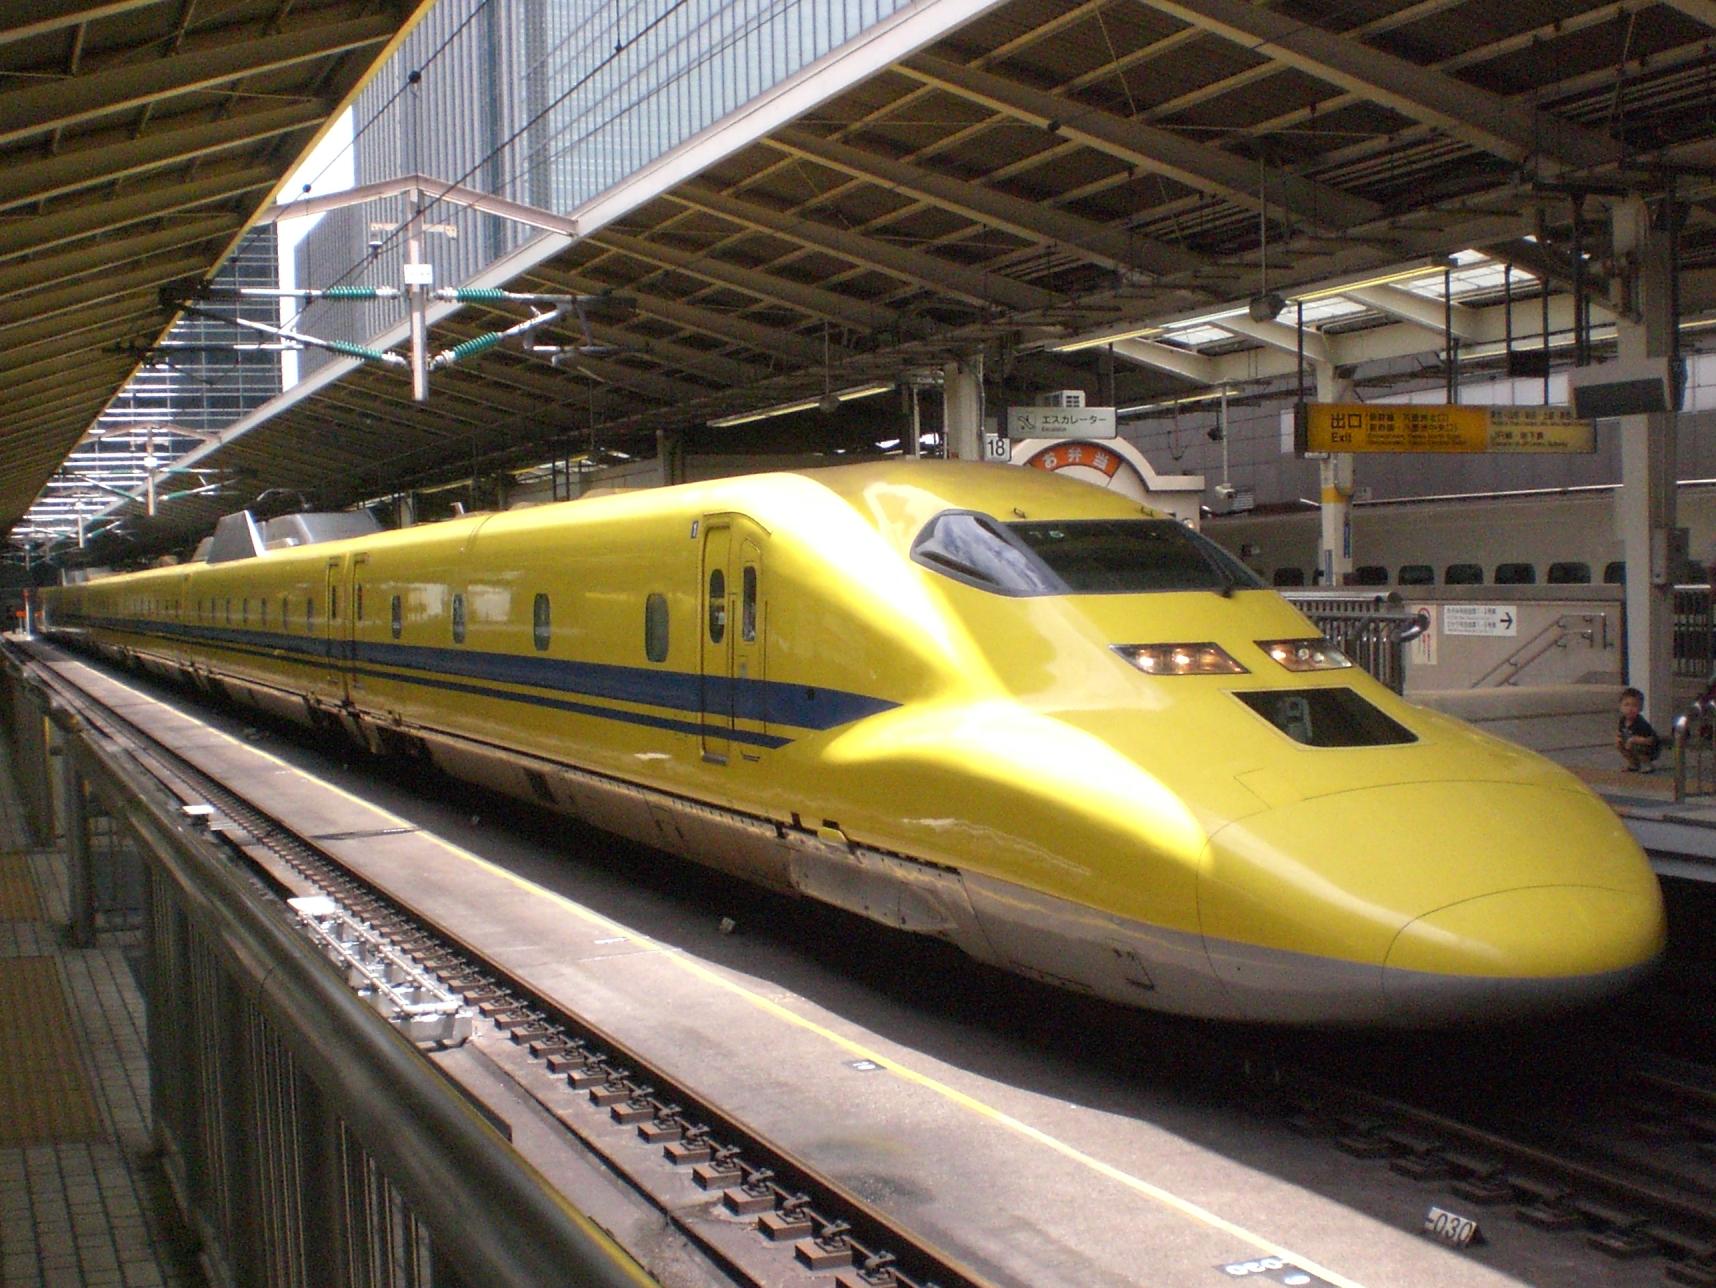 File:923 shinkansen T5 20080728.jpg